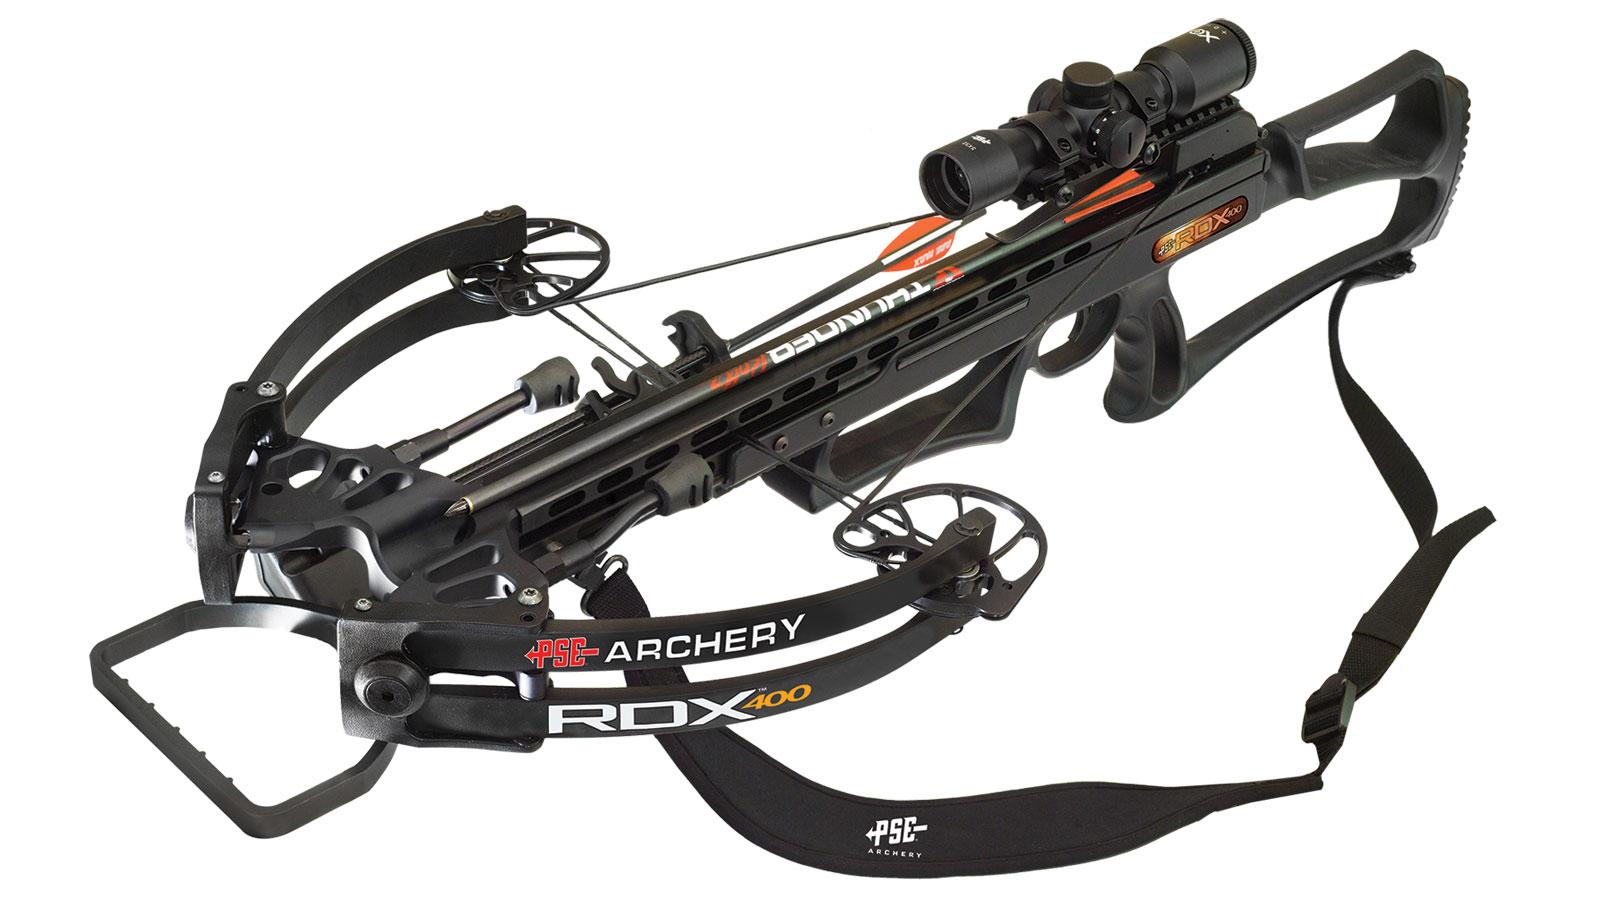 PSE Archery RDX 400 BK